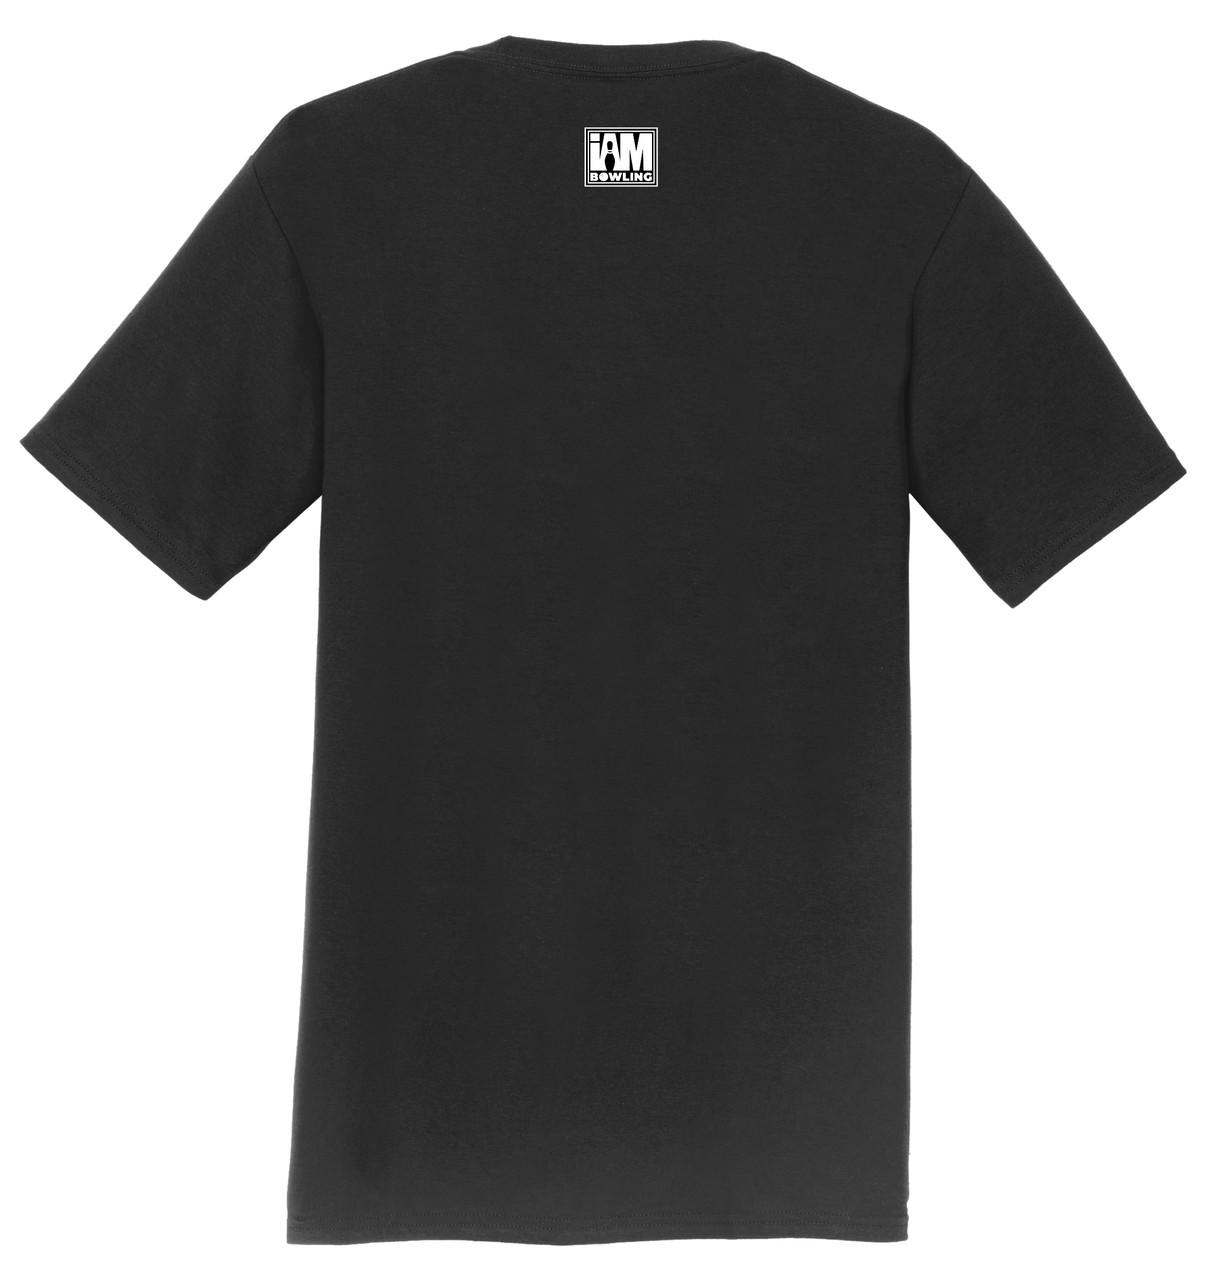 SRGBBFS T-Shirt - Roto Grip Star Logo - 6 Colors